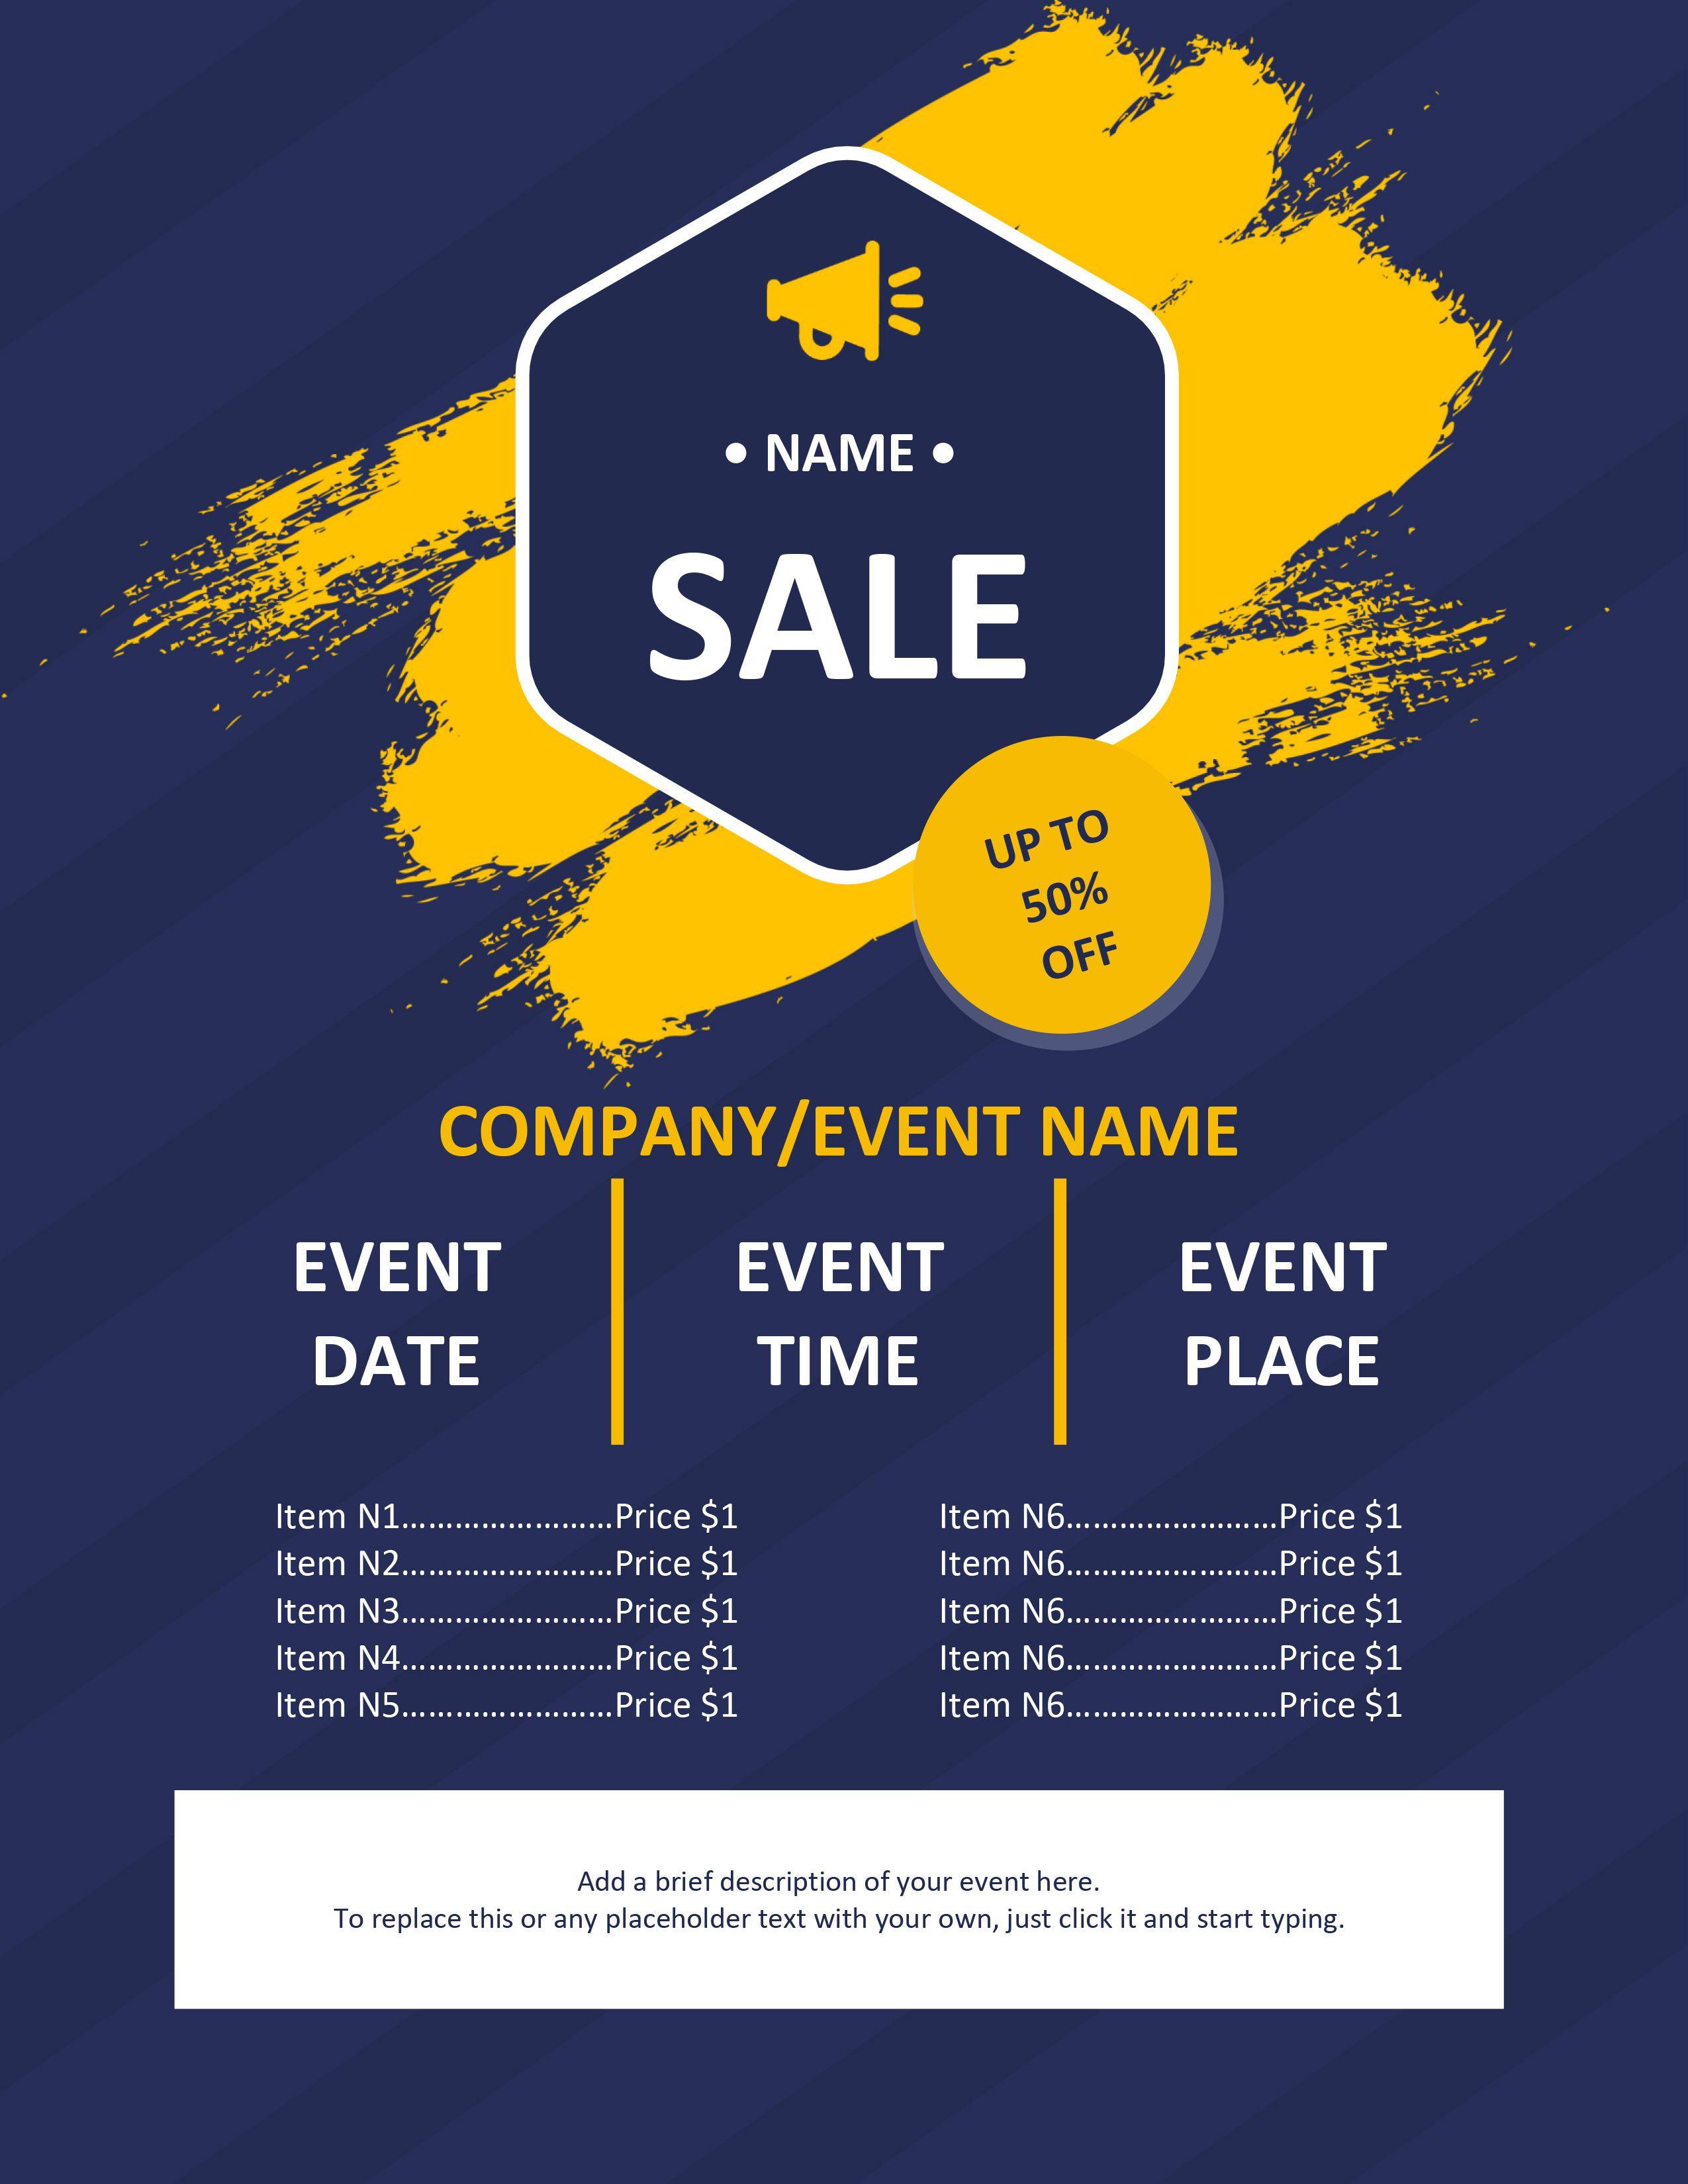 006 Impressive Event Flyer Template Free Word Sample Full